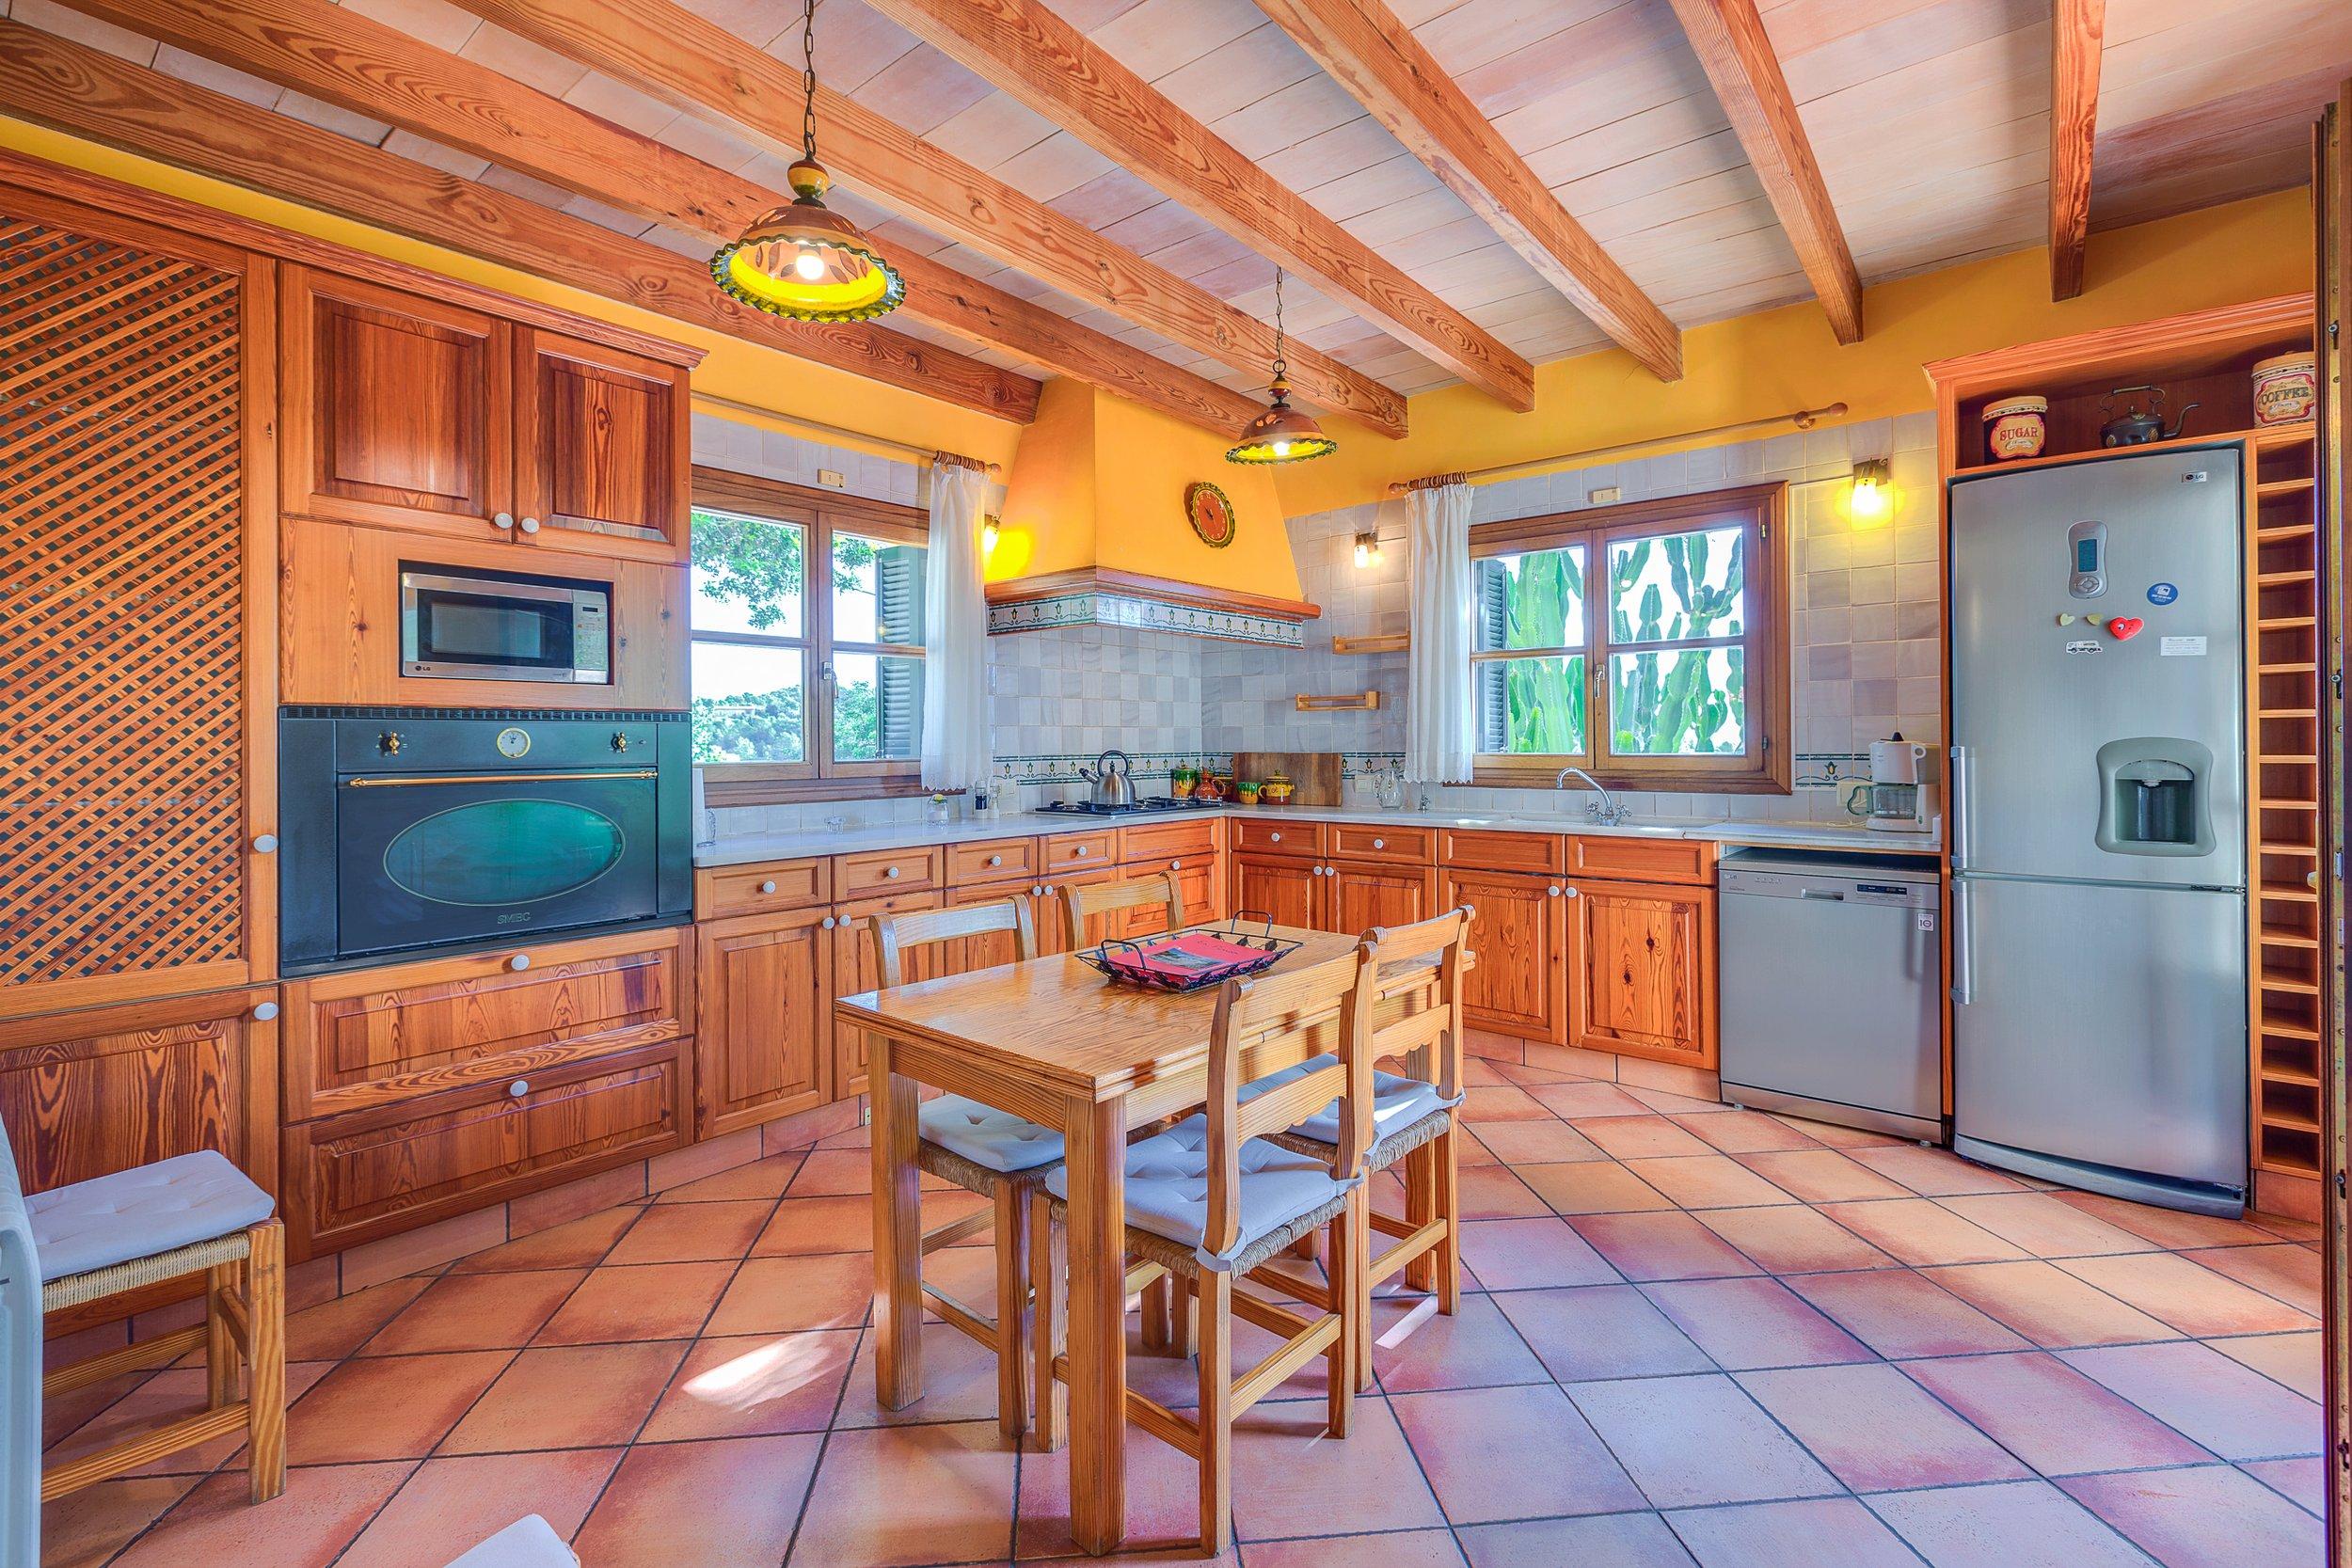 Maison de vacances Villa Cirera in Alaro (2611793), Alaro, Majorque, Iles Baléares, Espagne, image 17